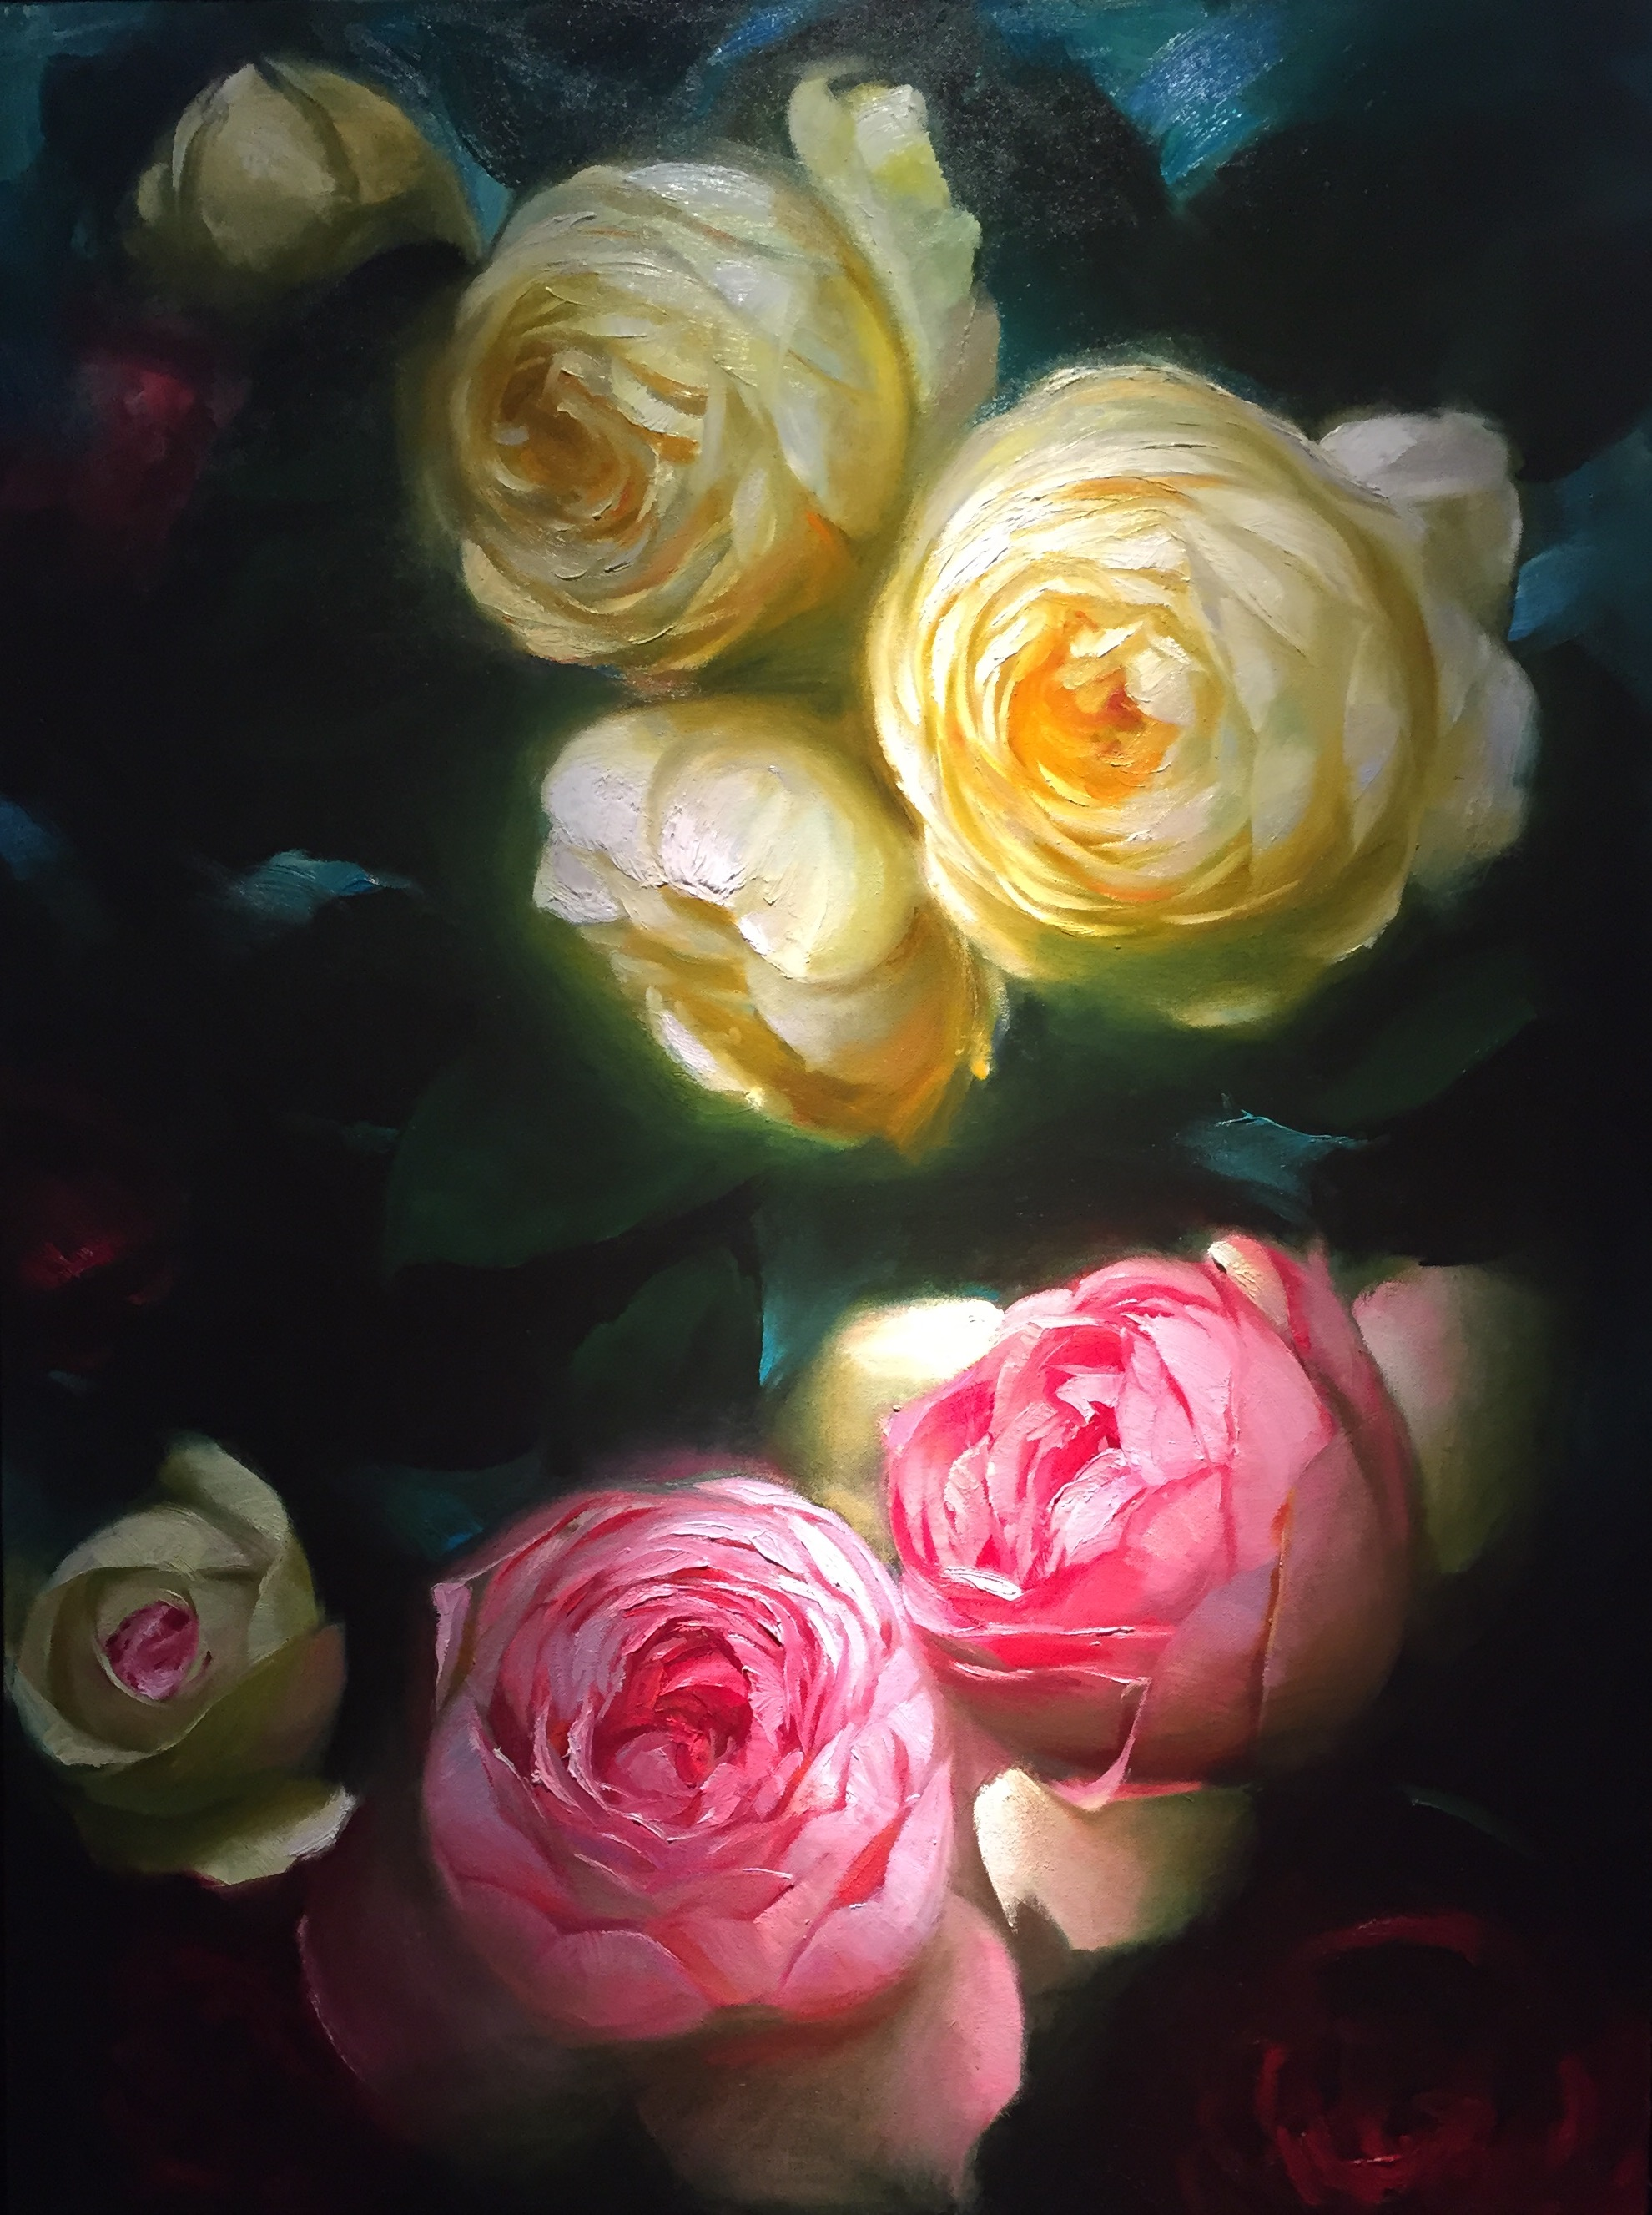 Roses in bloom (48x36)